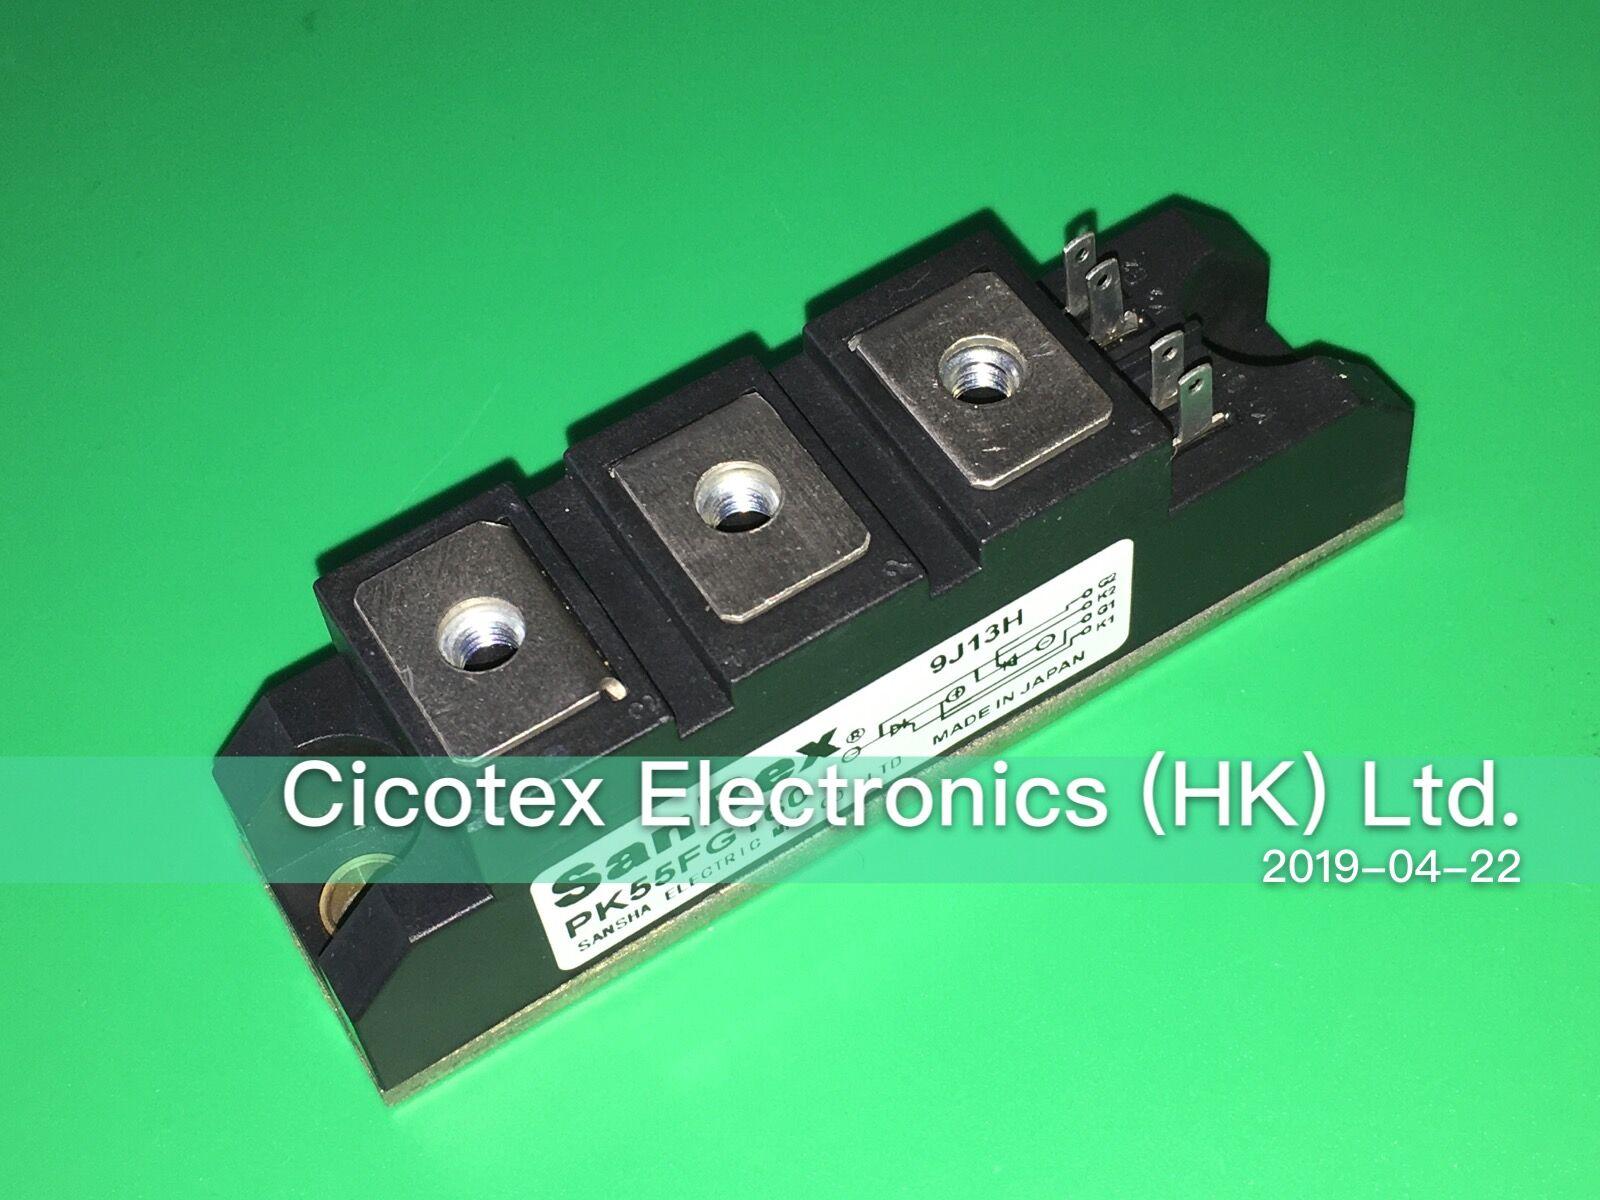 PK55FG160 SCR MODULE IGBT 55A 1600V PK55FG-160 IC PK55FG160 SCR MODULE IGBT 55A 1600V PK55FG-160 IC